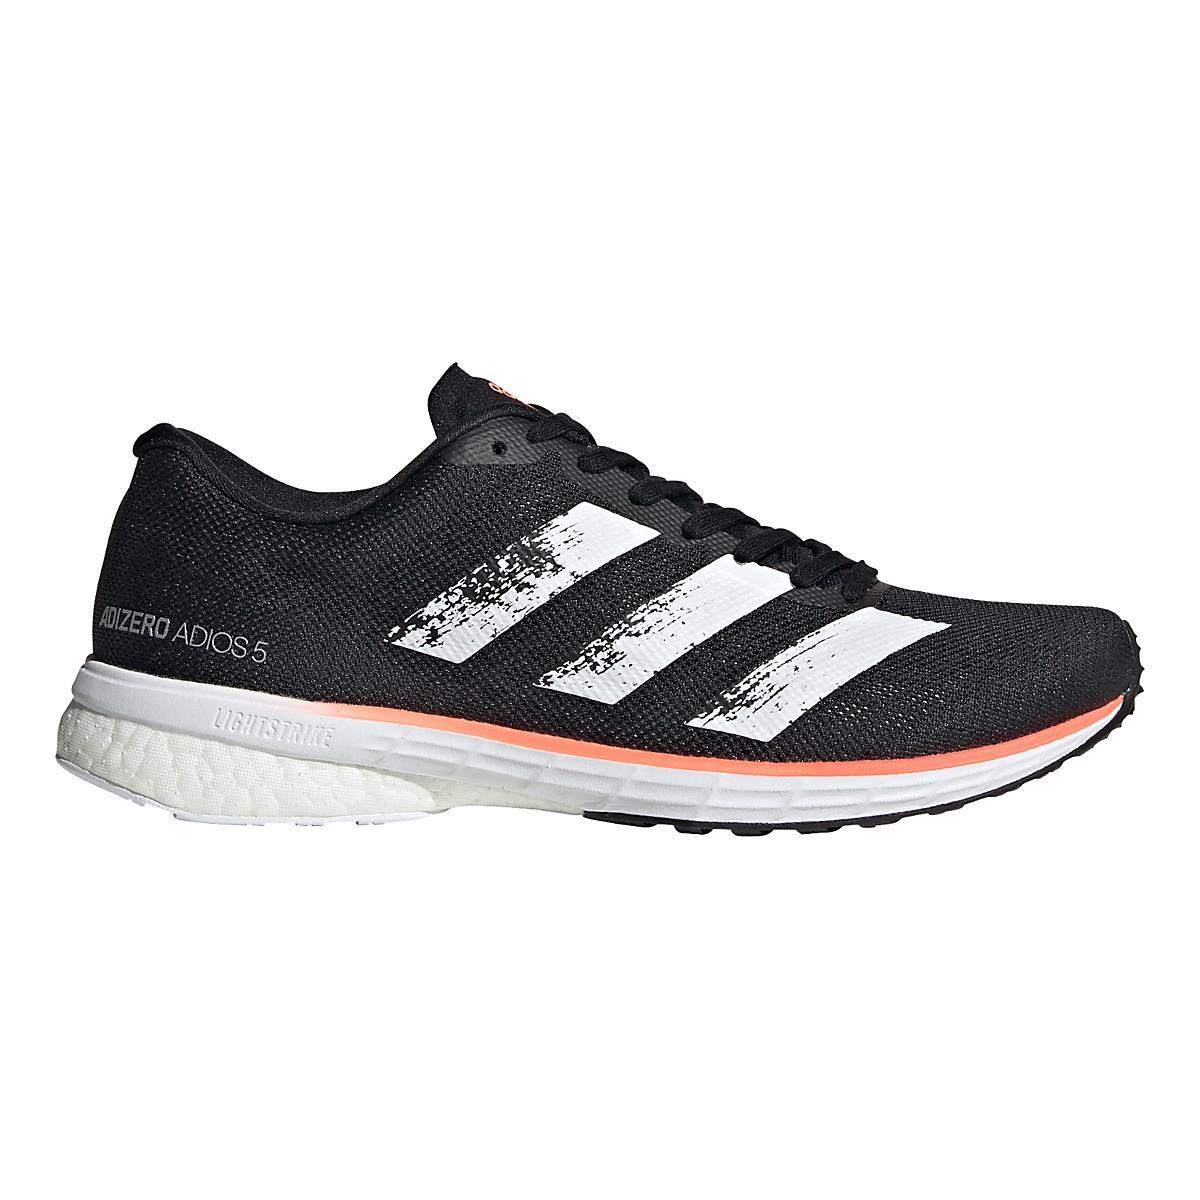 Womens Adidas Adizero Adios 5 Running Shoe At Road Runner Sports